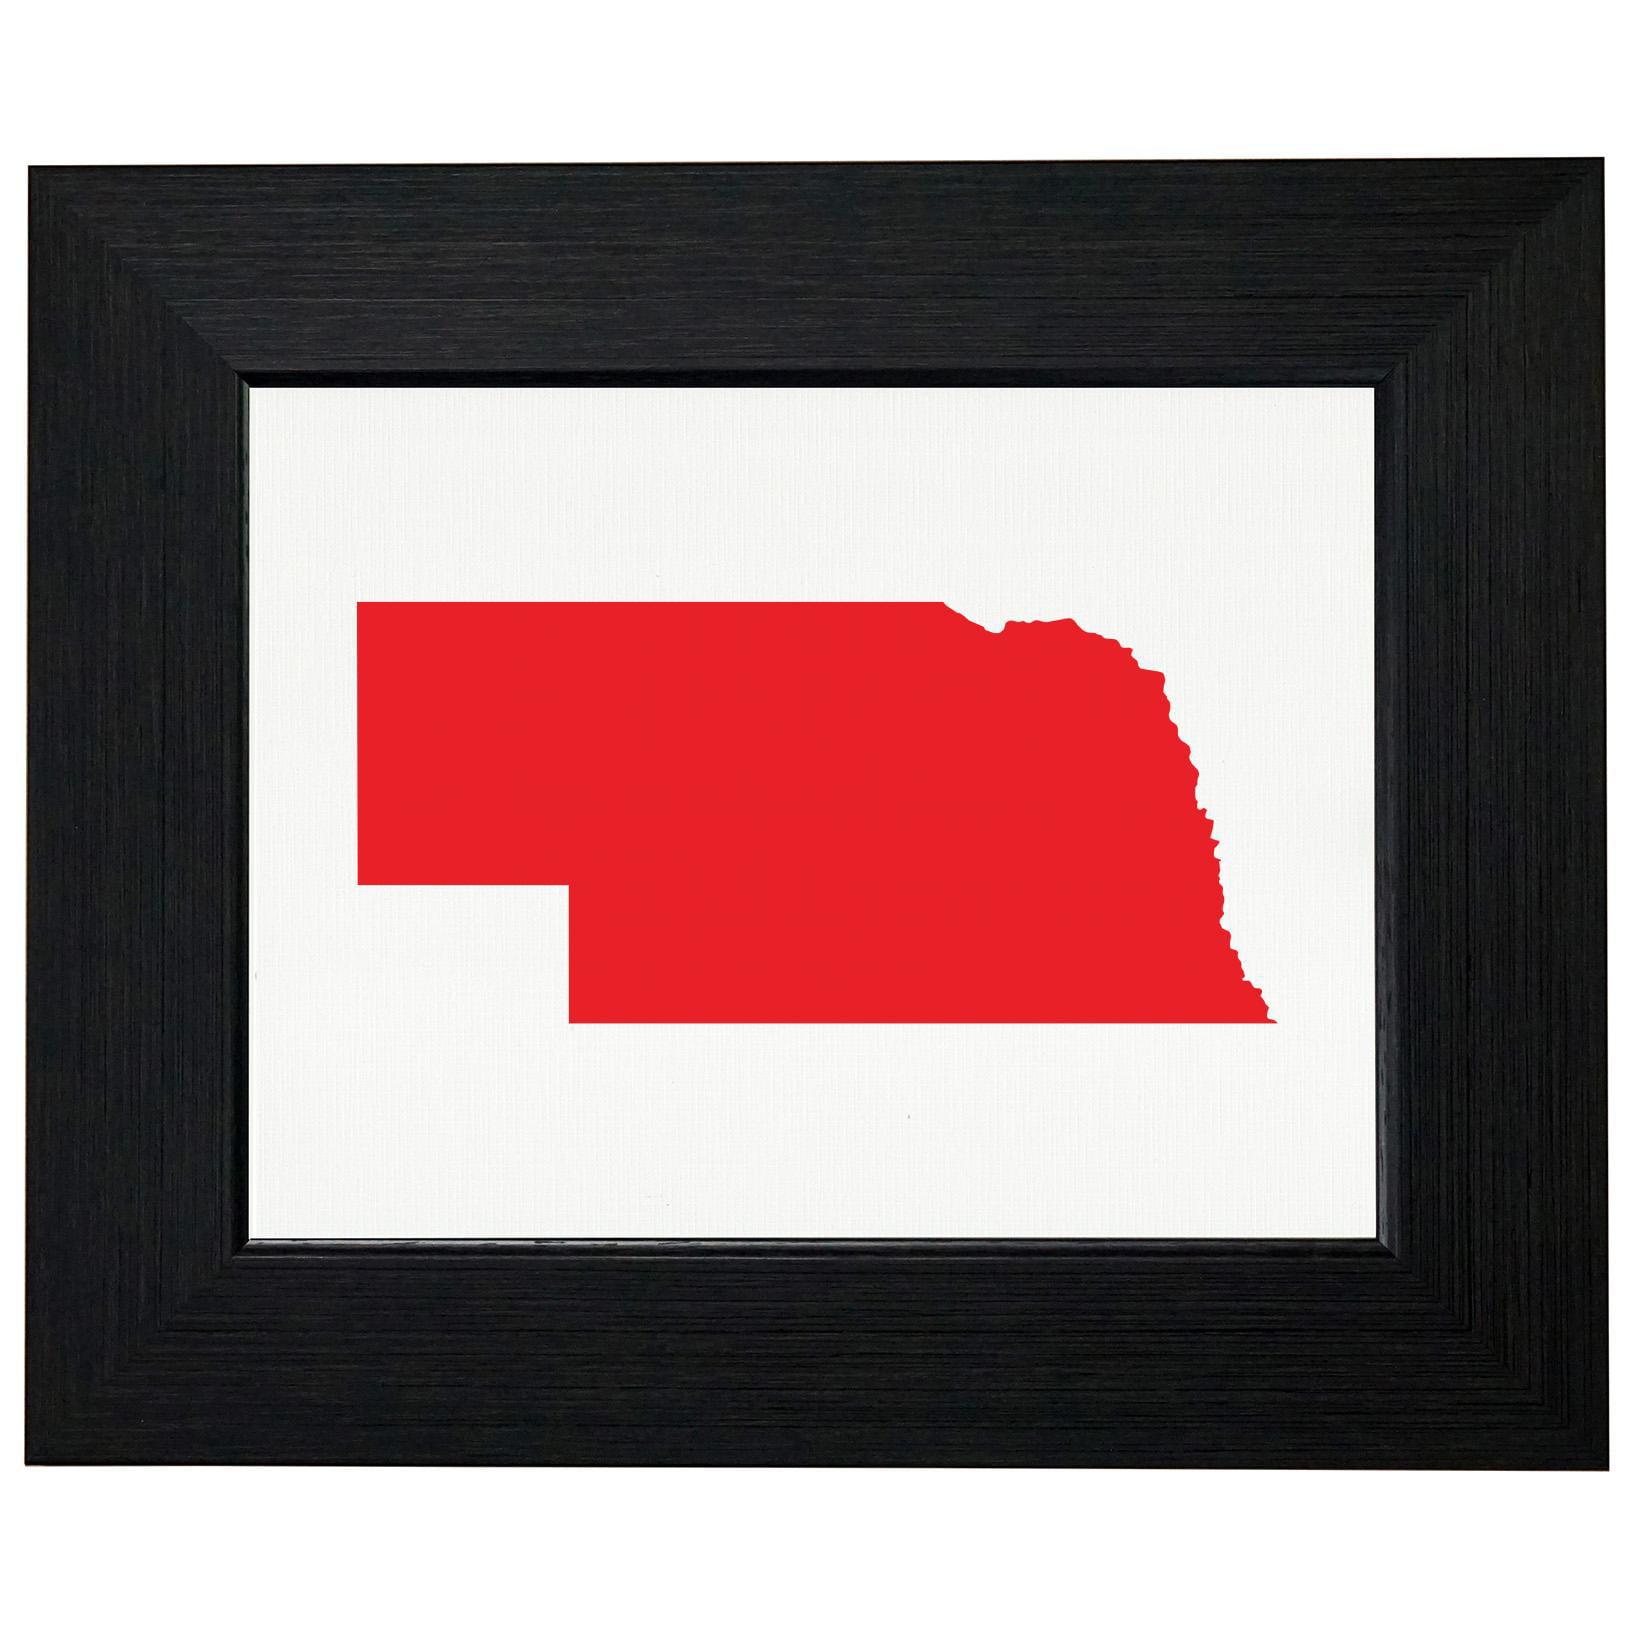 Nebraska Red Republican - Election Silhouette Framed Print Poster Wall or Desk Mount Options